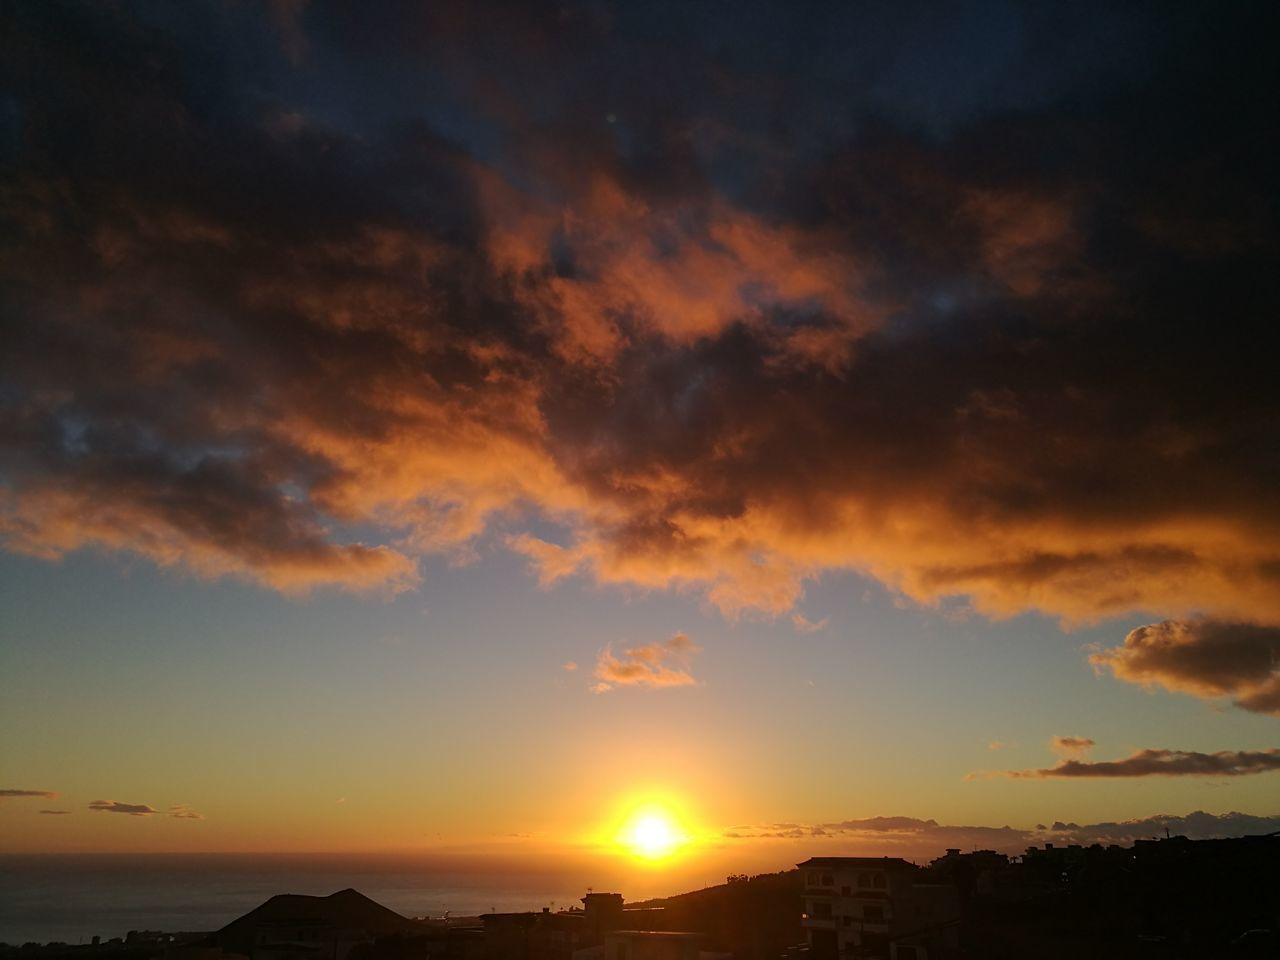 Atardecer Tenerife Tenerife Island Beauty In Nature Natural Beauty Pothography Naturaleza🌾🌿 HuaweiP9Photography HuaweiP9 Orange Color Sunset Gold ColoredBeatiful Good Day Lasabinita Tenerife Sur Sin Filtros Huawei P9.